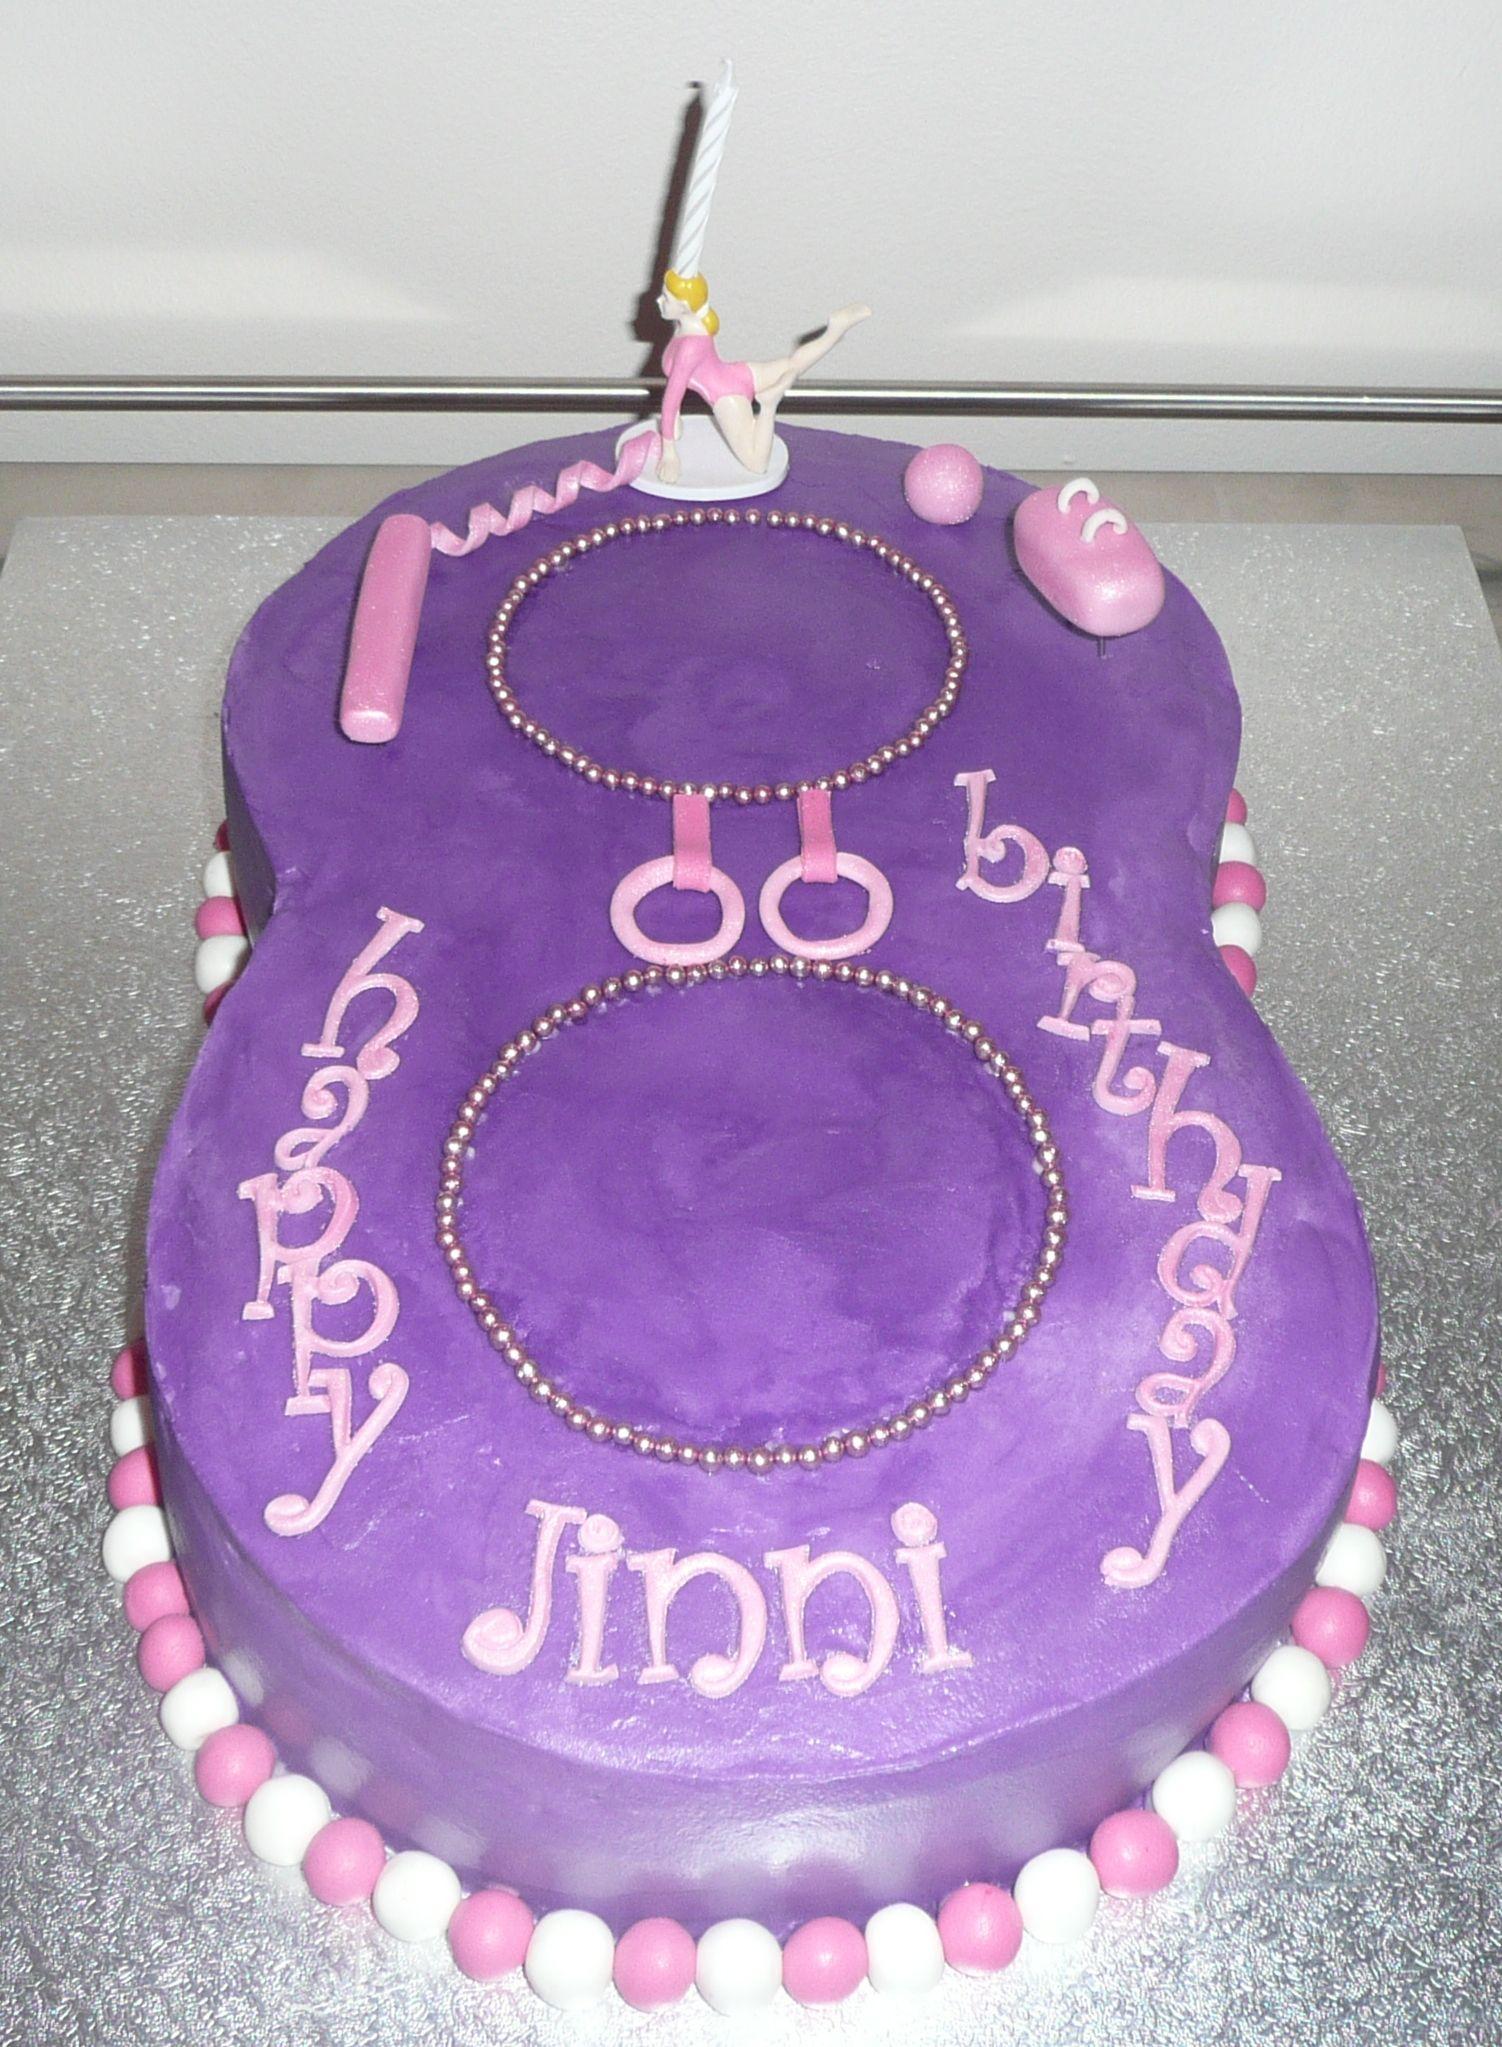 gymnastic cake topper - Google Search